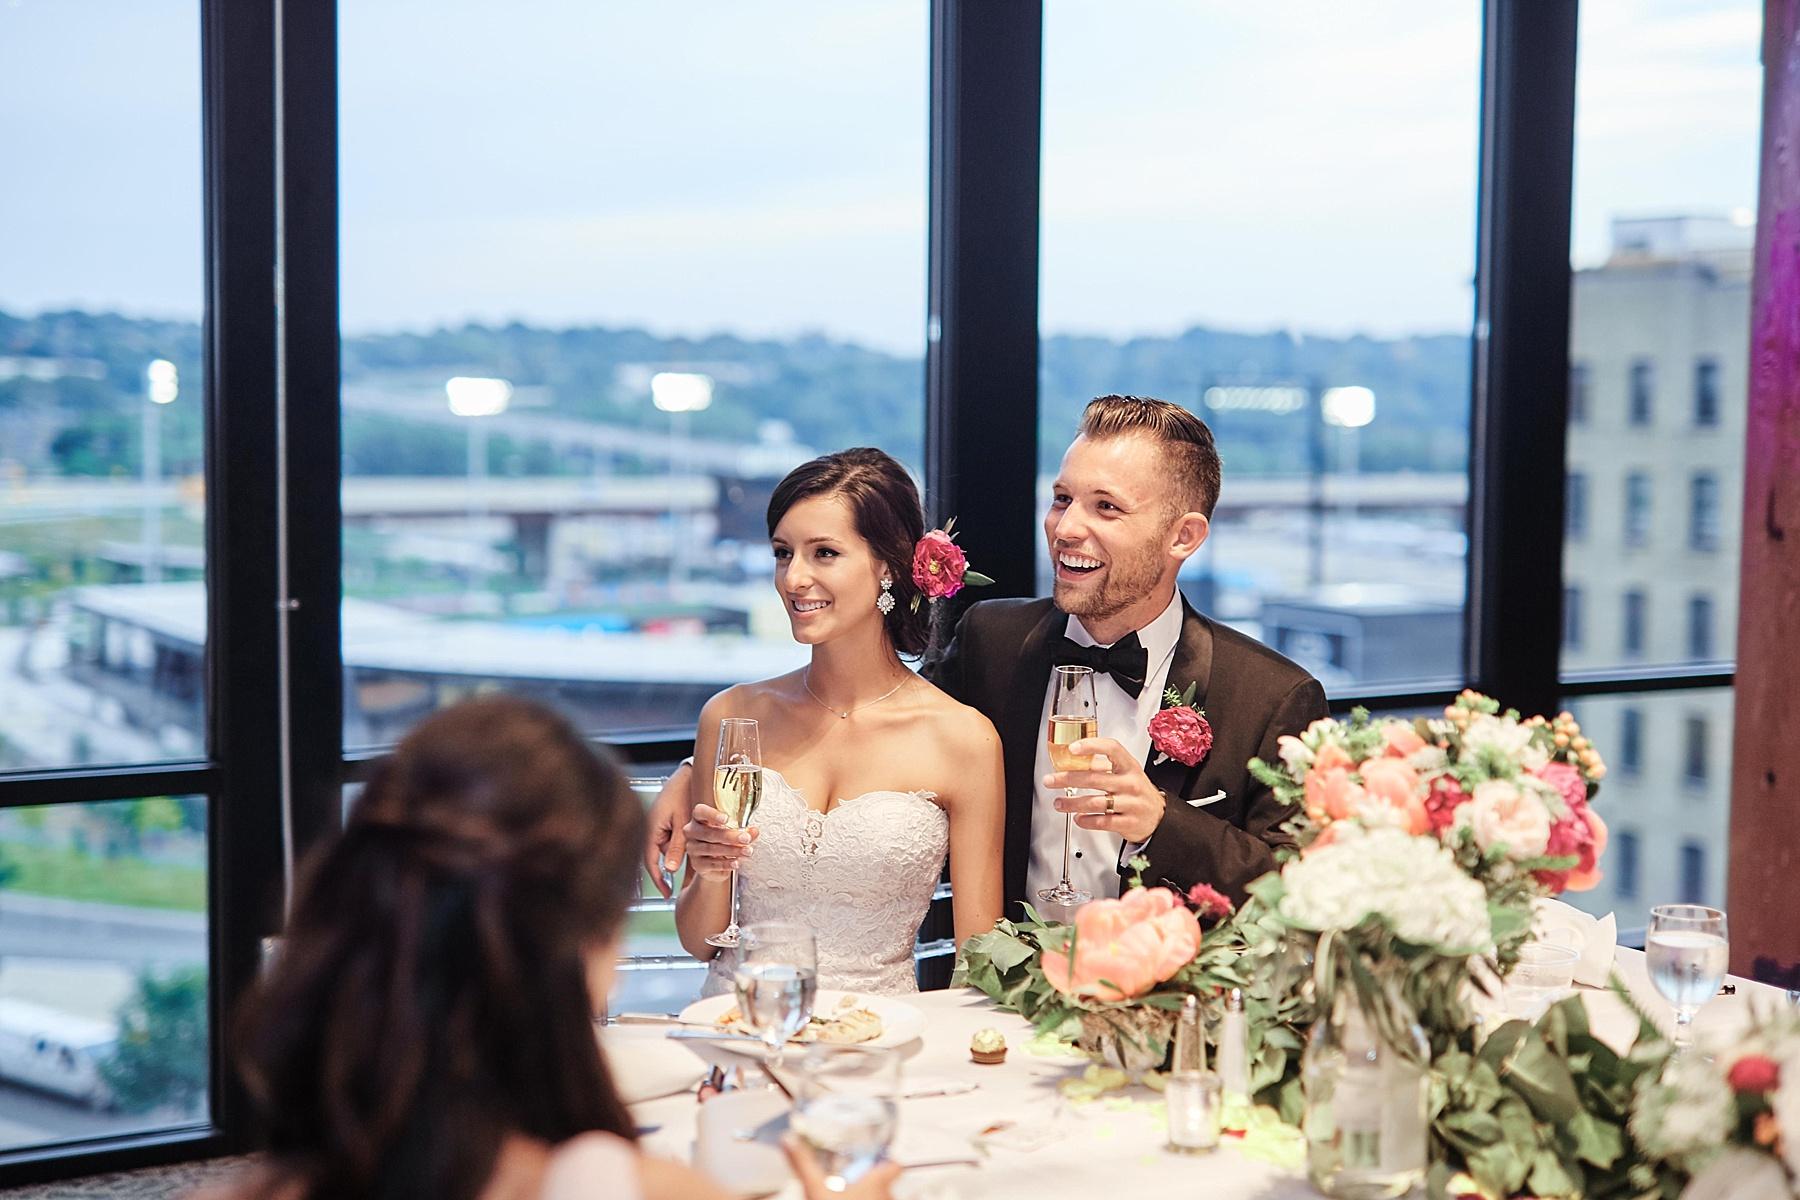 ABULAE-Wedding-Saint-paul-MN-Josh-Sofia-Wedding-Mears-Park_0826.jpg